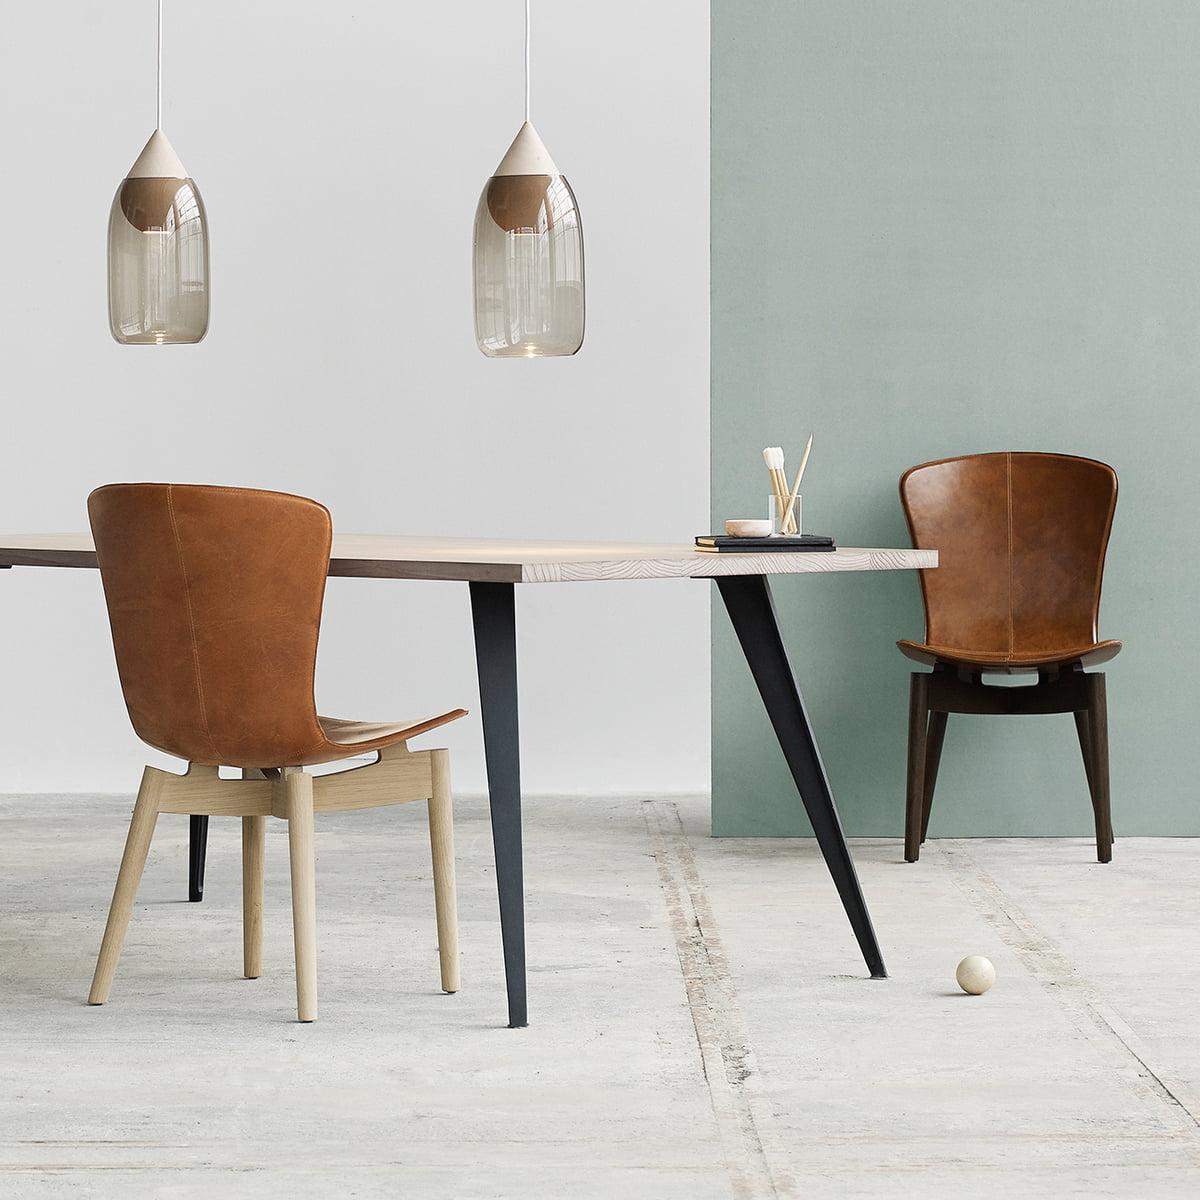 Mater Shell spisebordsstol, mat lakeret eg Ultra cognac læder